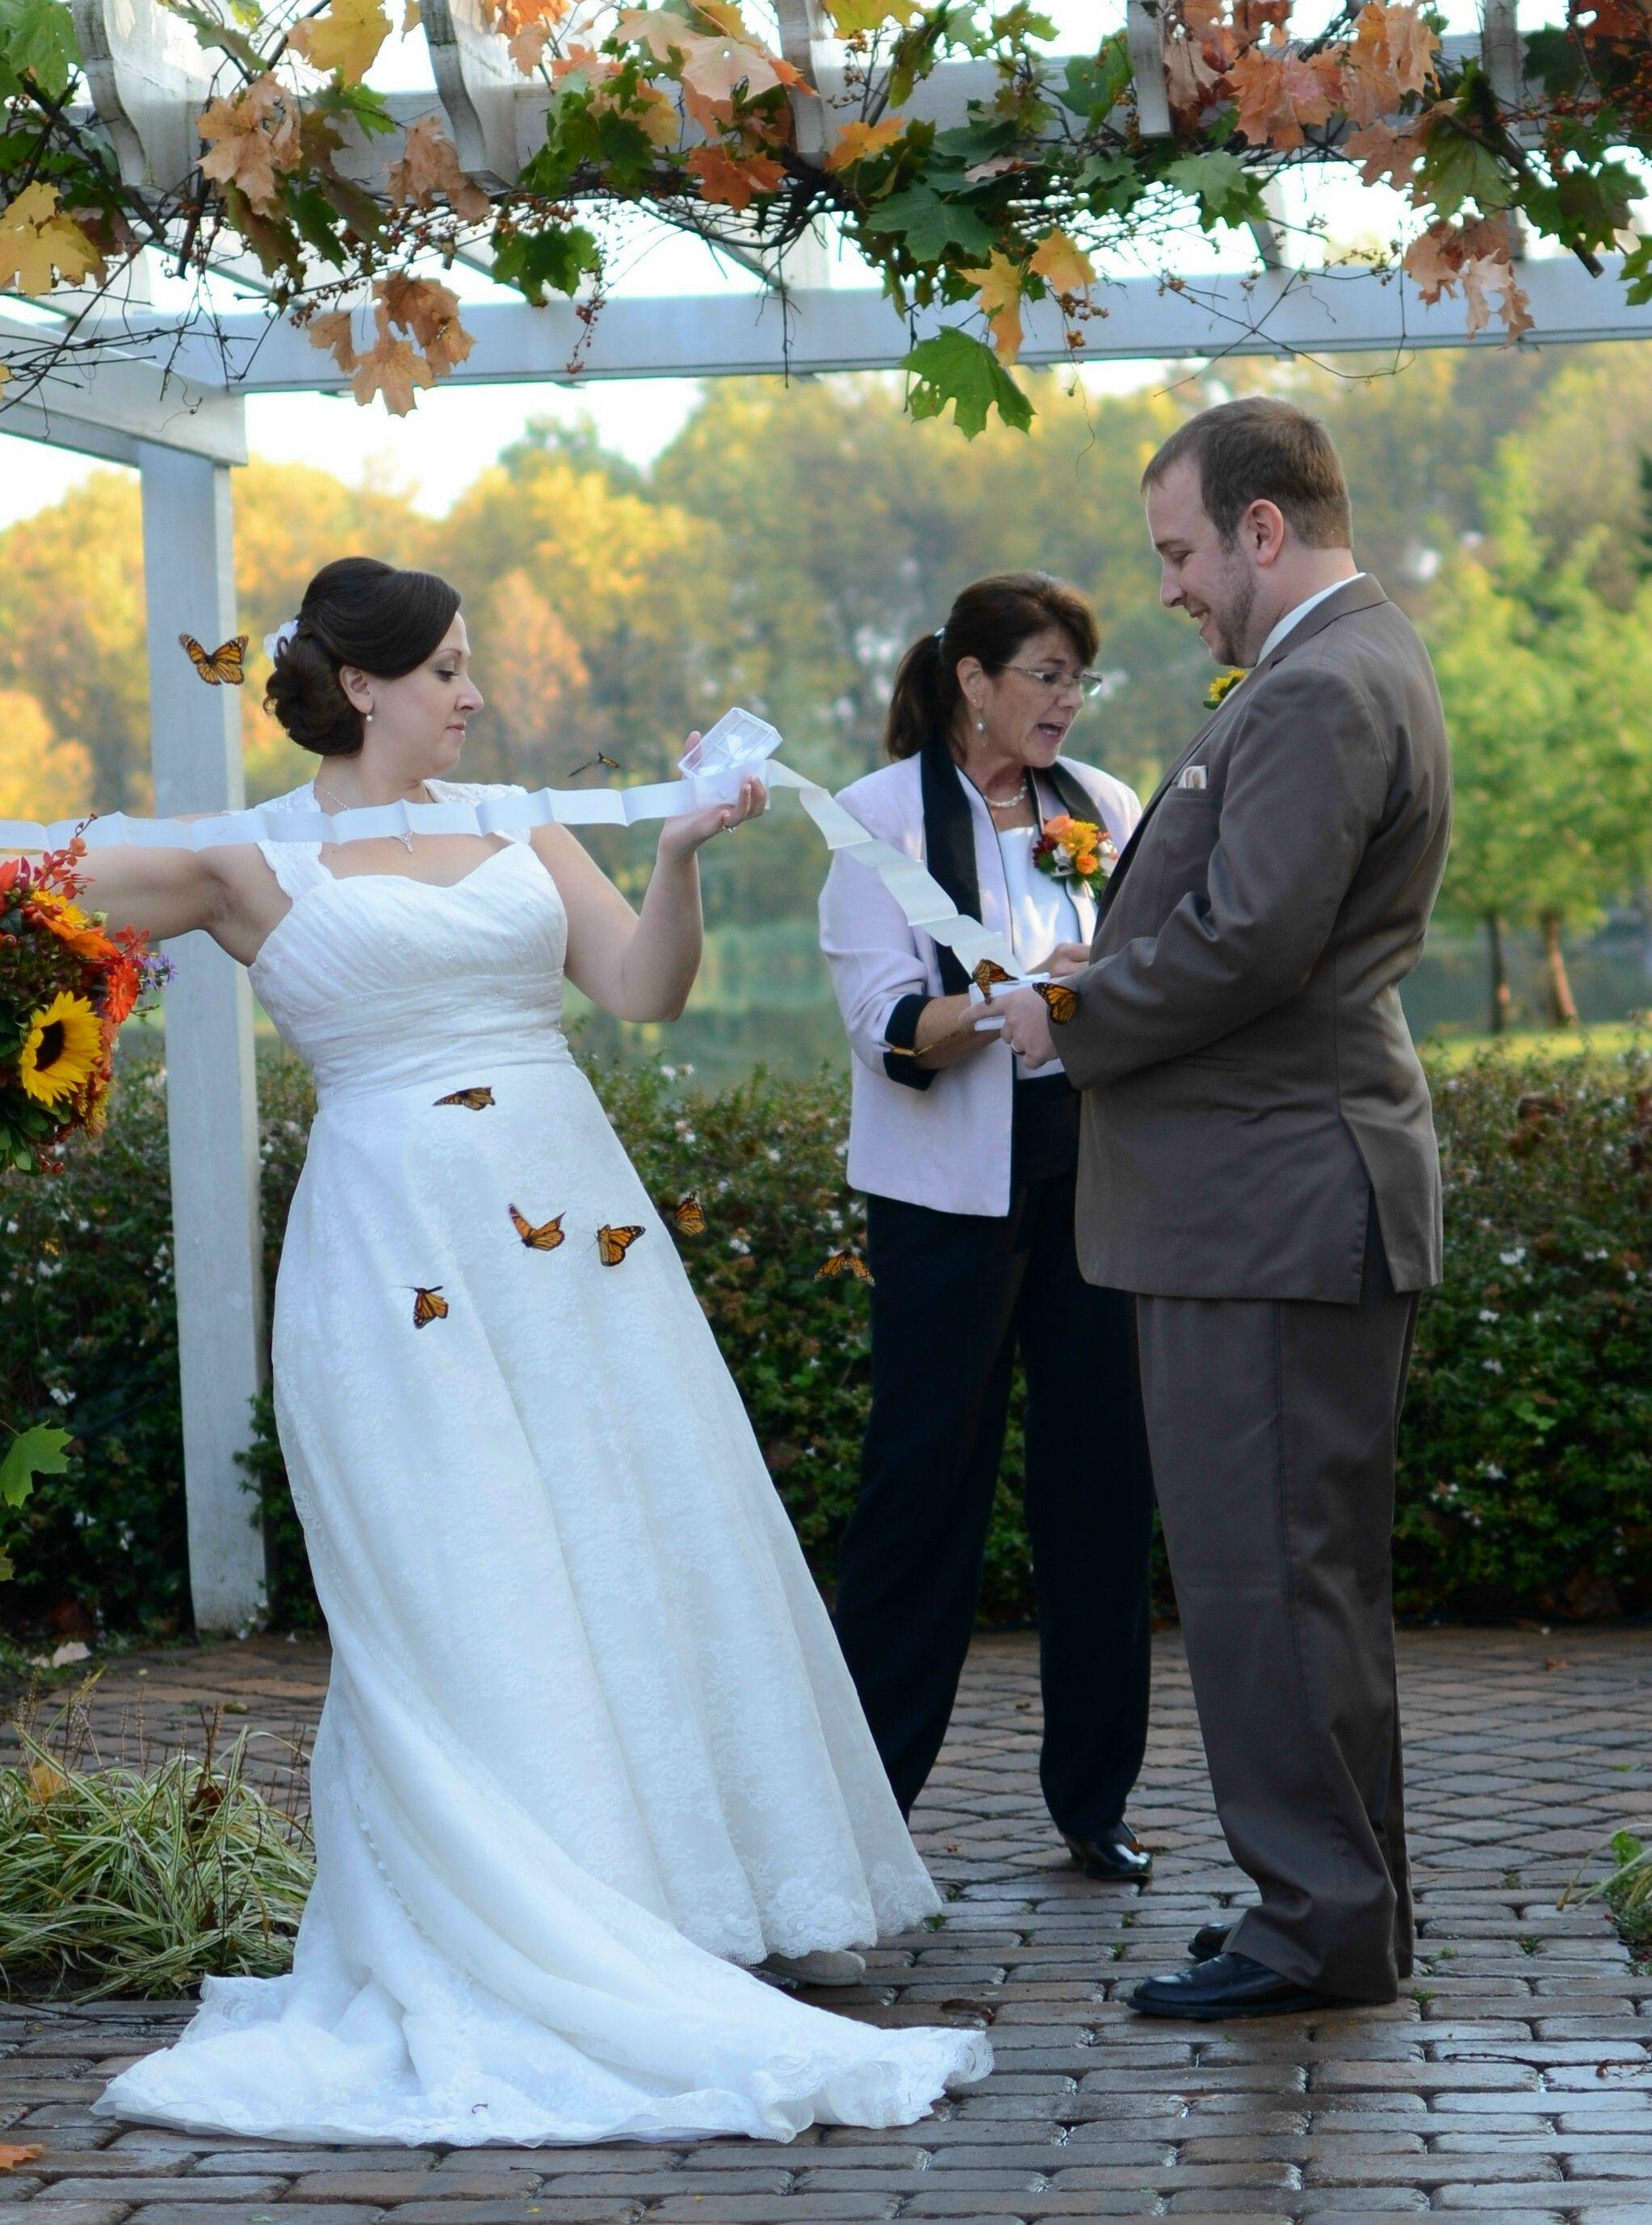 release live butterflies for your special wedding butterflyreleasesbyscom